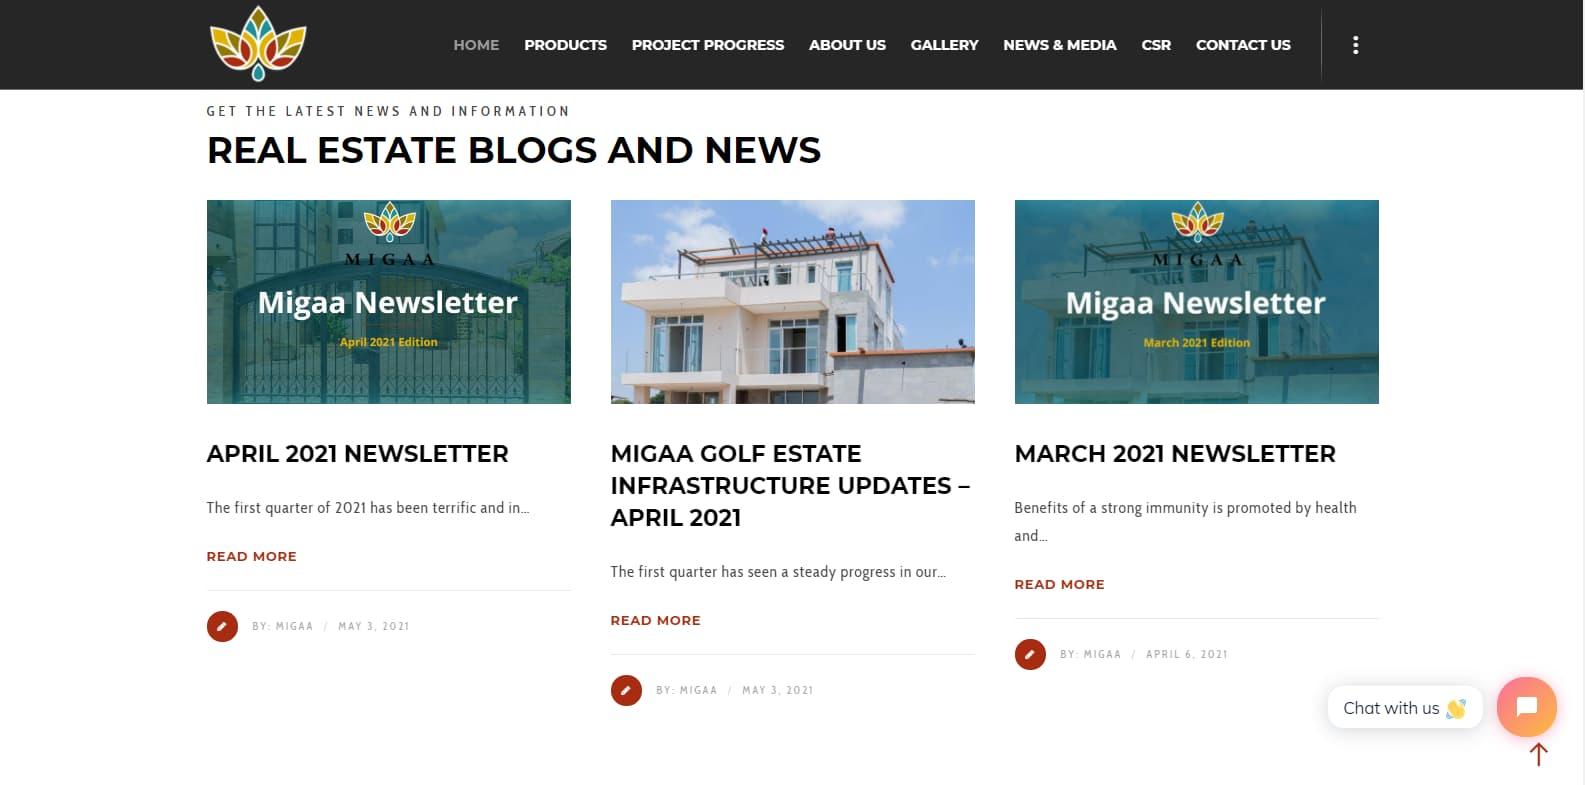 Content Marketing Campaign - Migaa Golf Estate